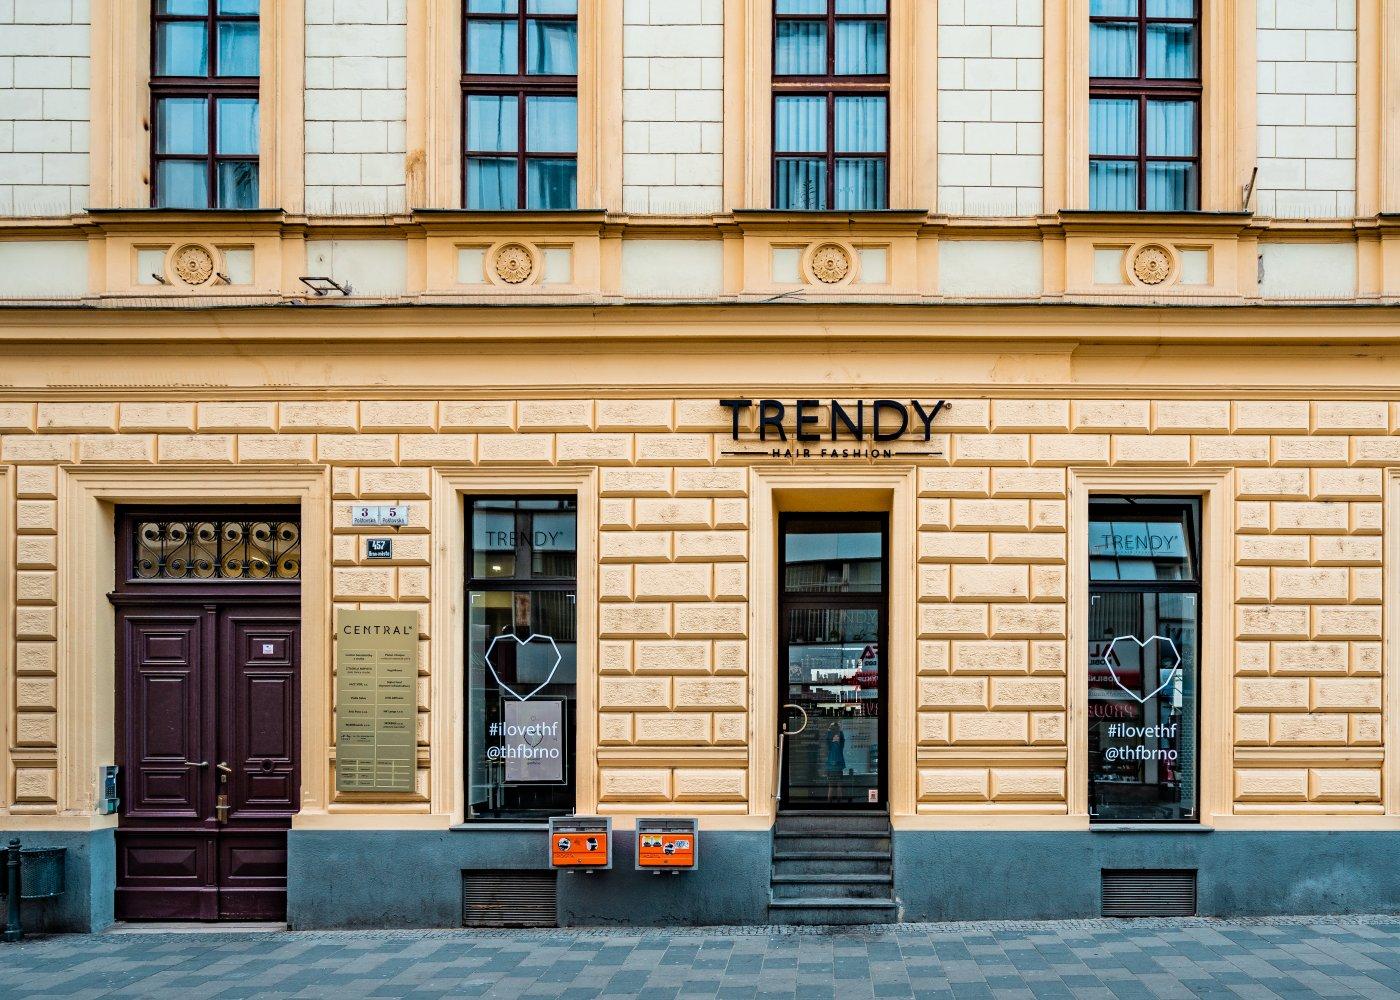 Pronájem prostor budova Central Brno